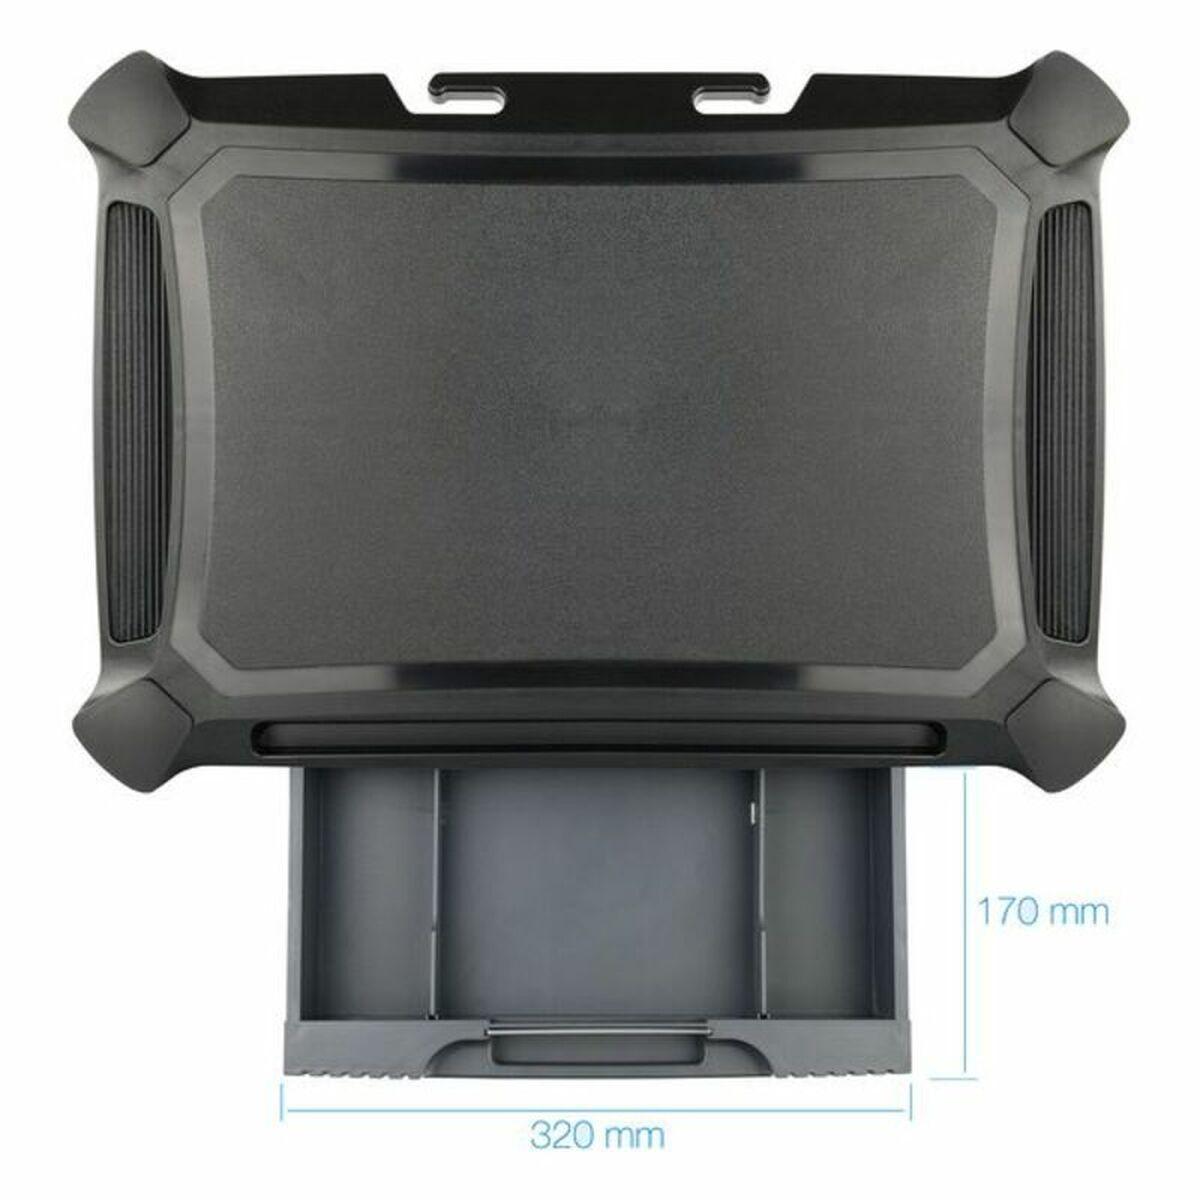 Adjustable support TooQ MMPSSD01 Black